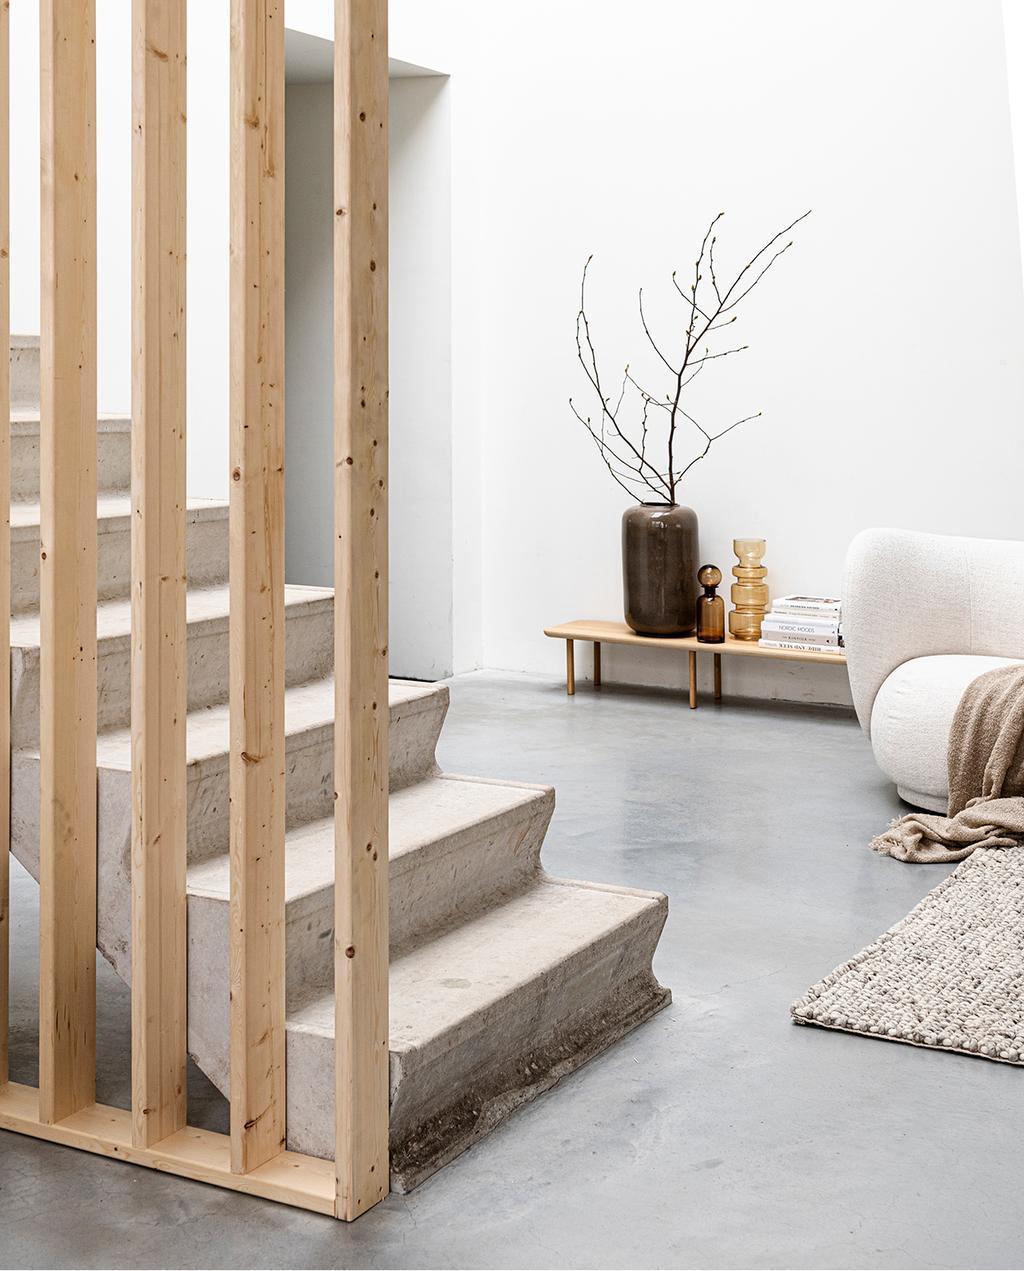 vtwonen 2020 DIY special 01 | trap divider van houten latten